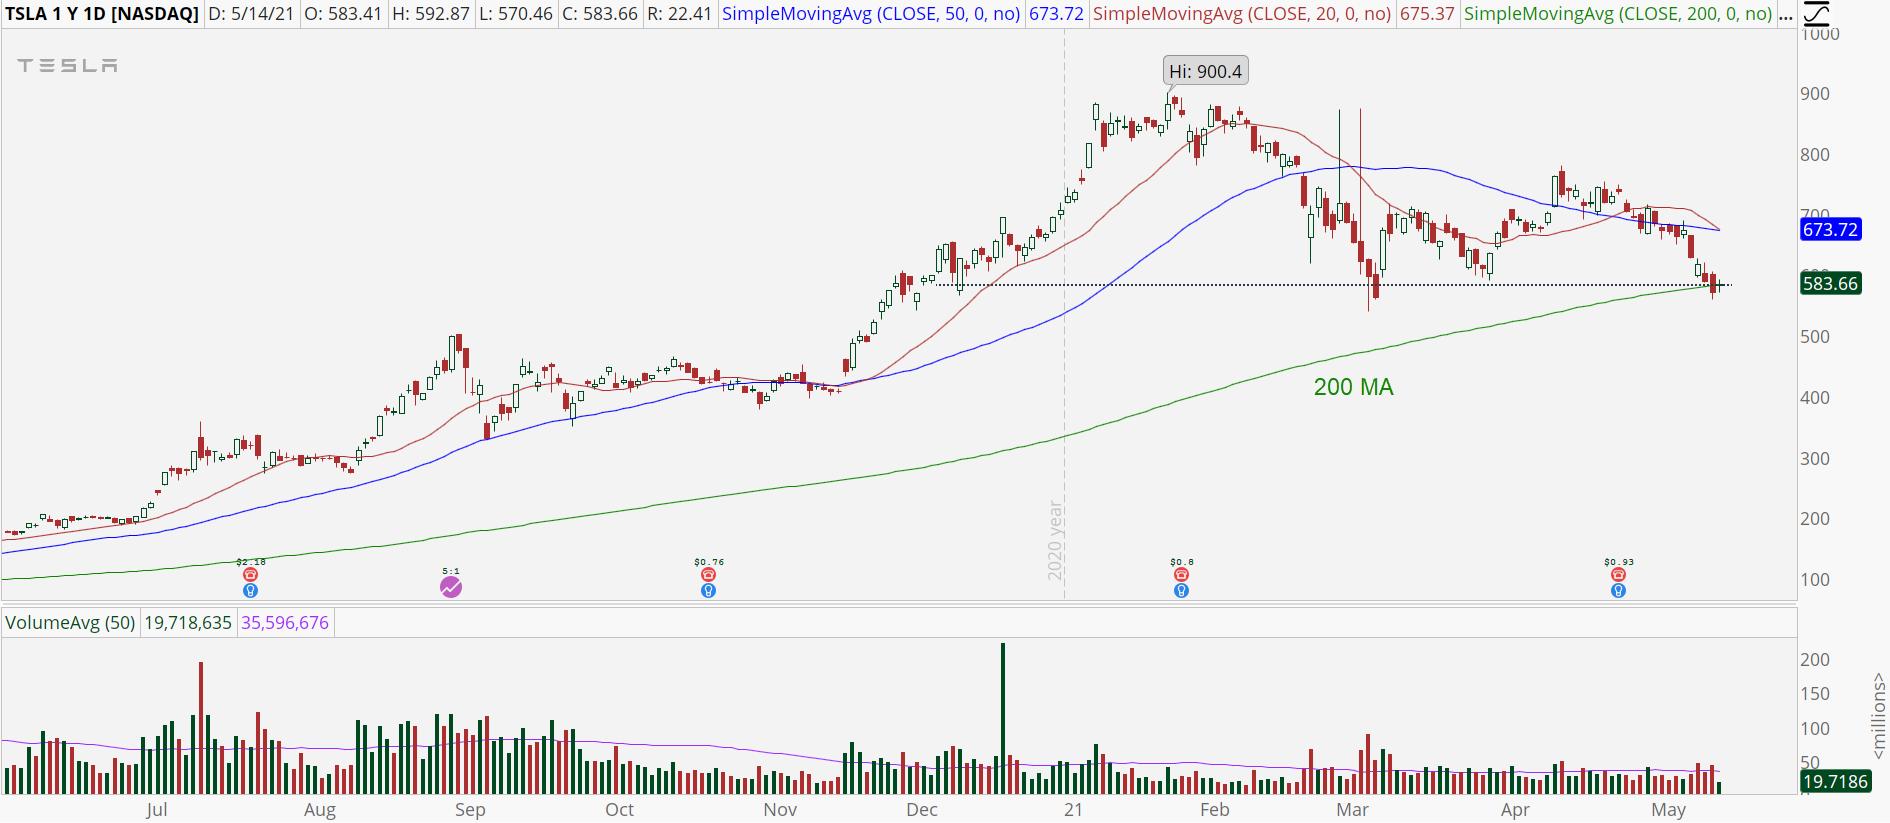 Tesla (TSLA) stock with key support test